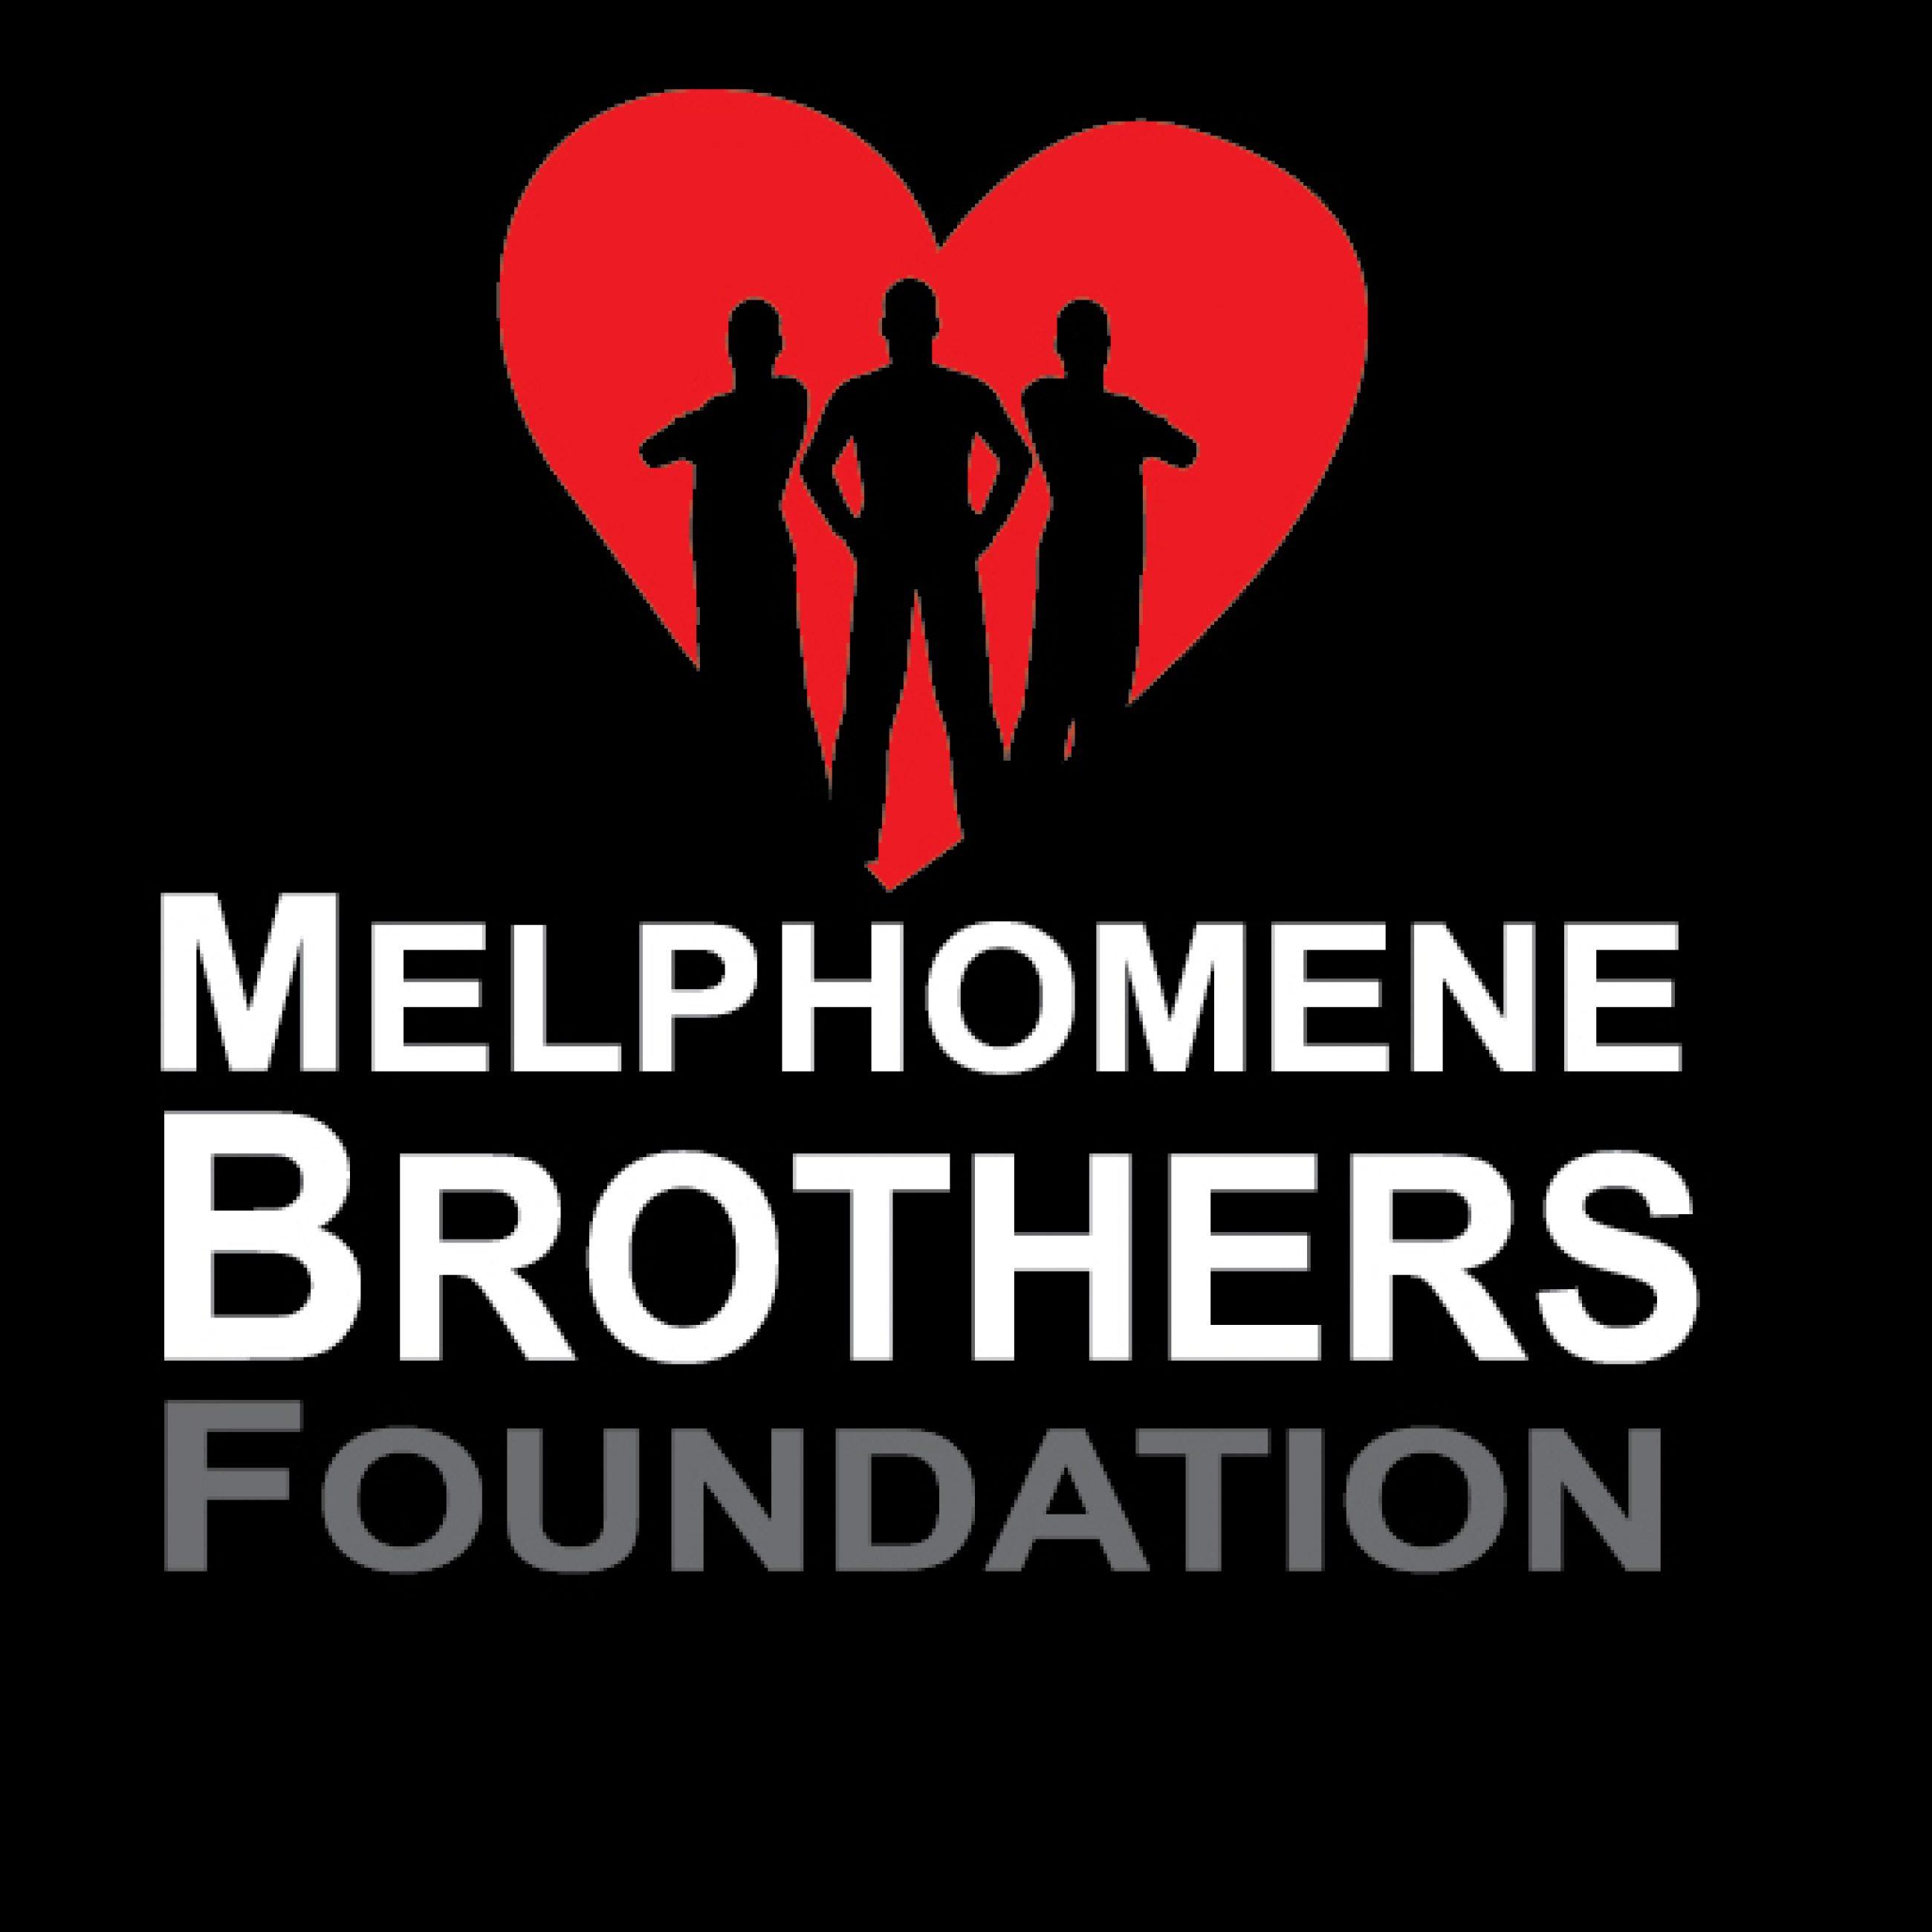 Melphomene Brothers Foundation